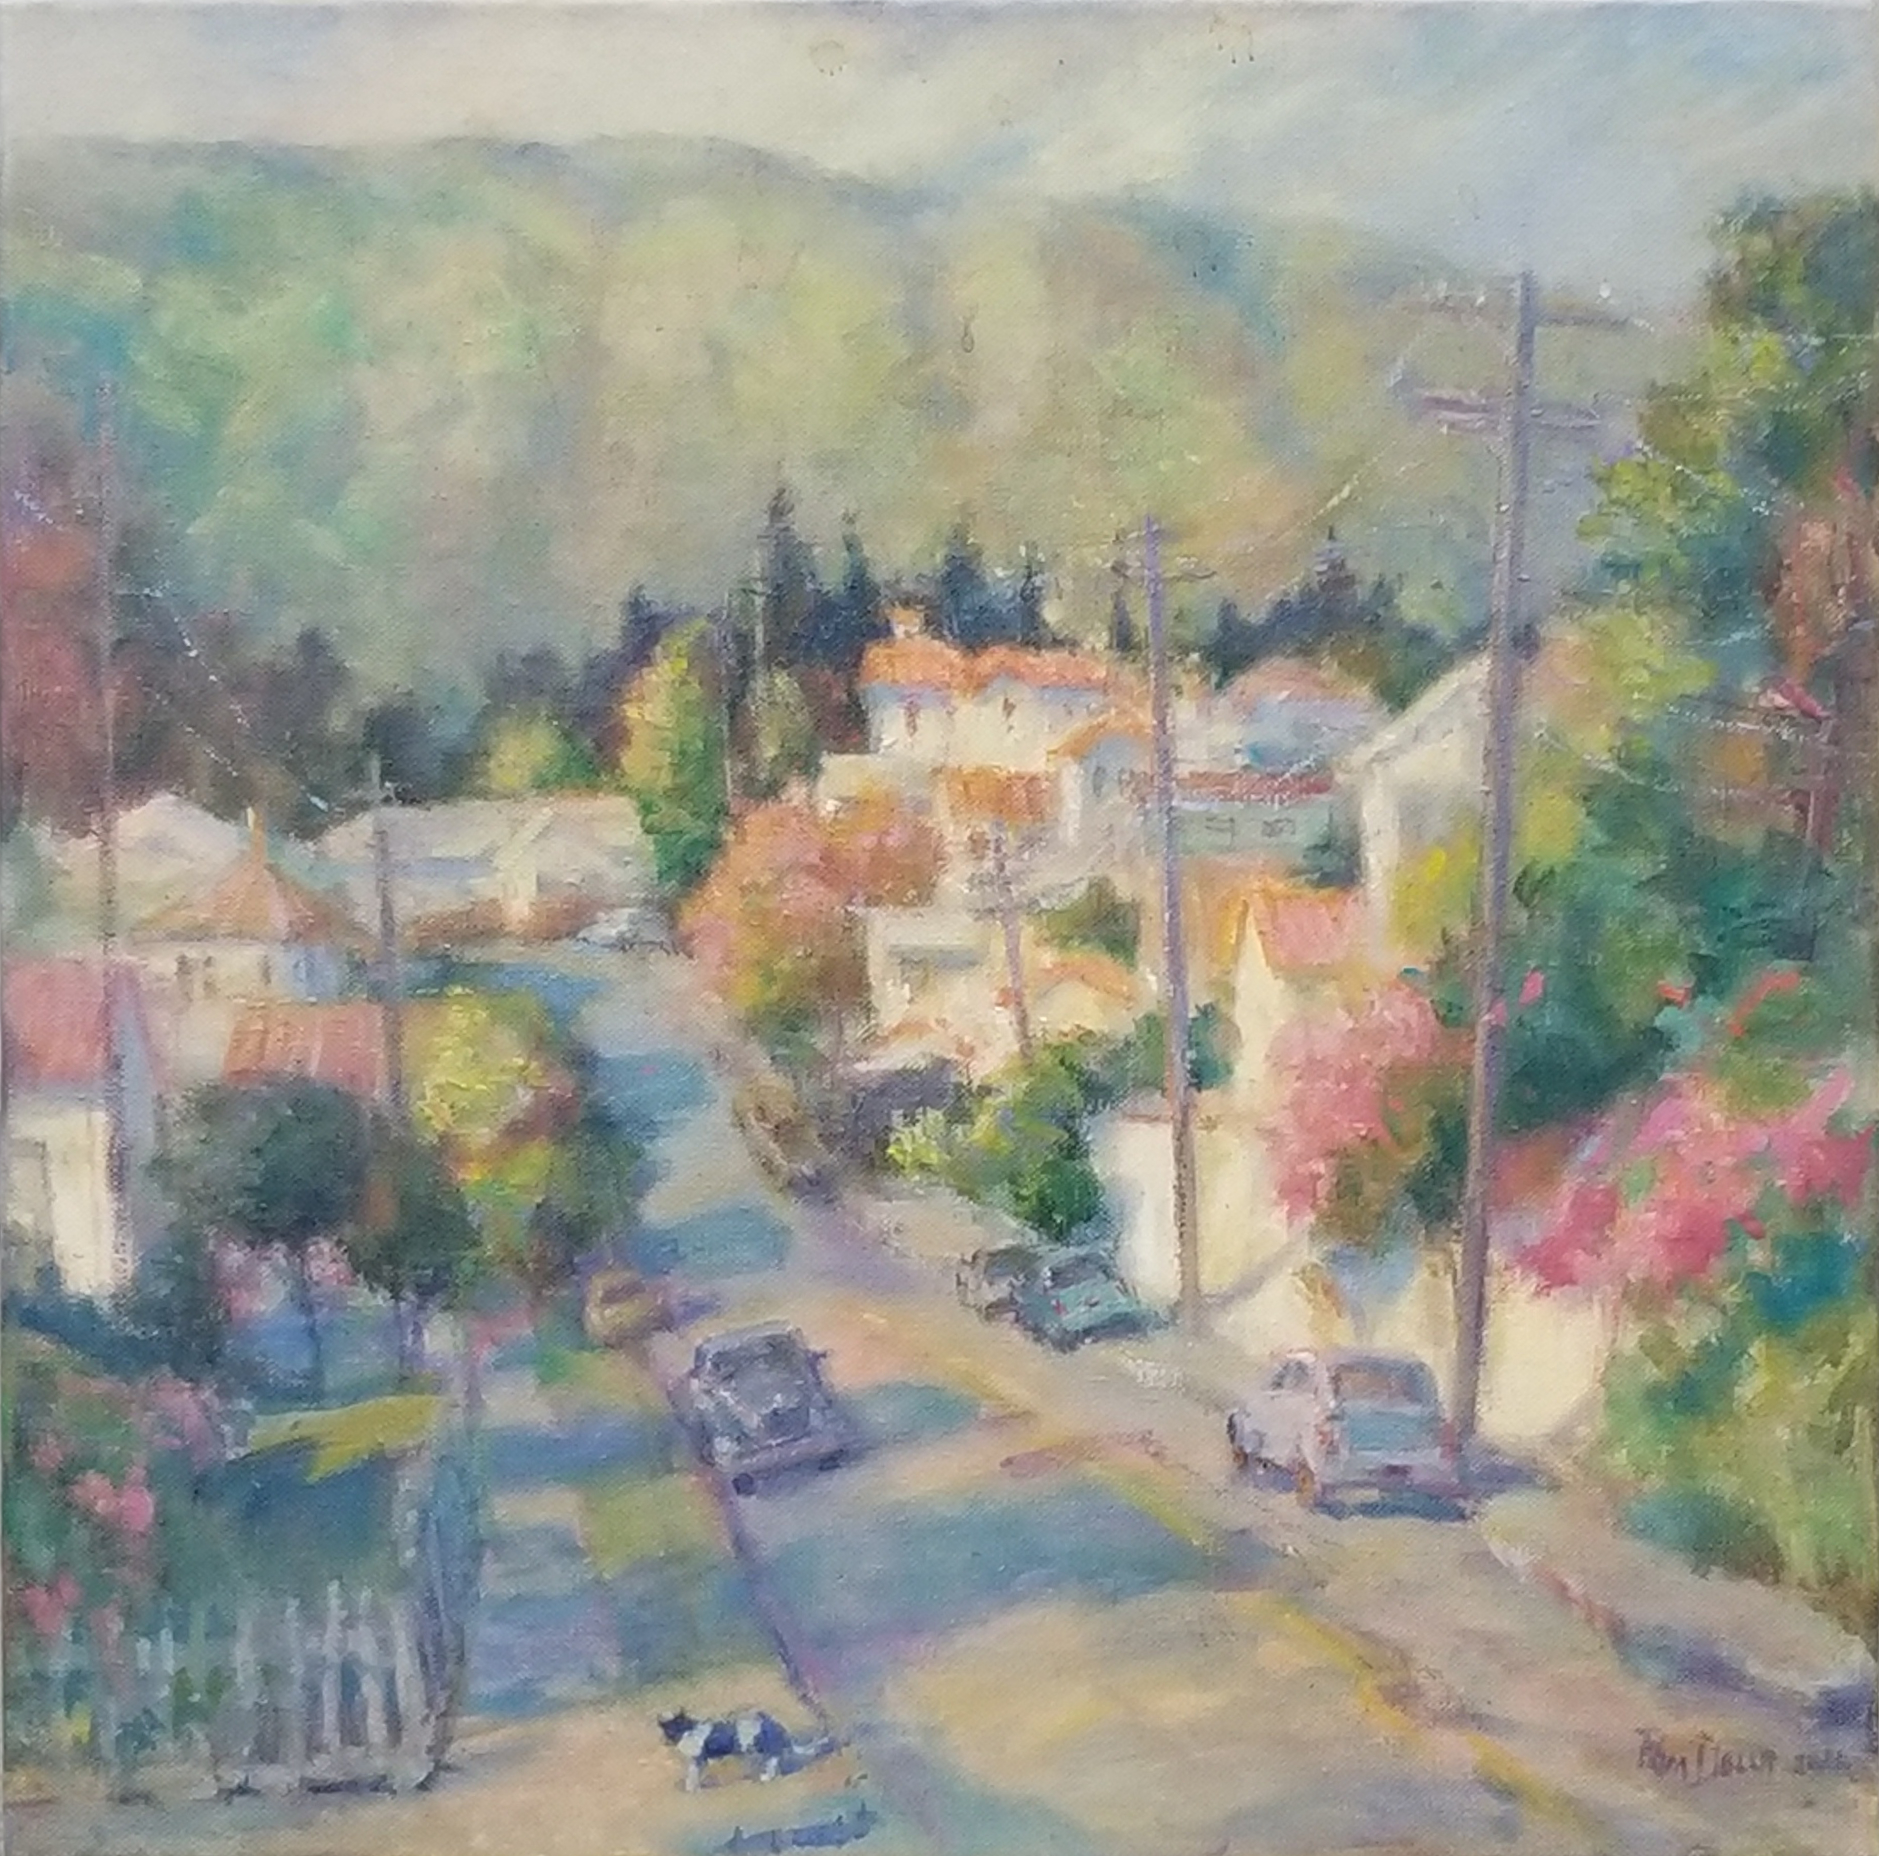 Near Main Street, Martinez:Pam Della, 18 x 18, oil on canvas, $700